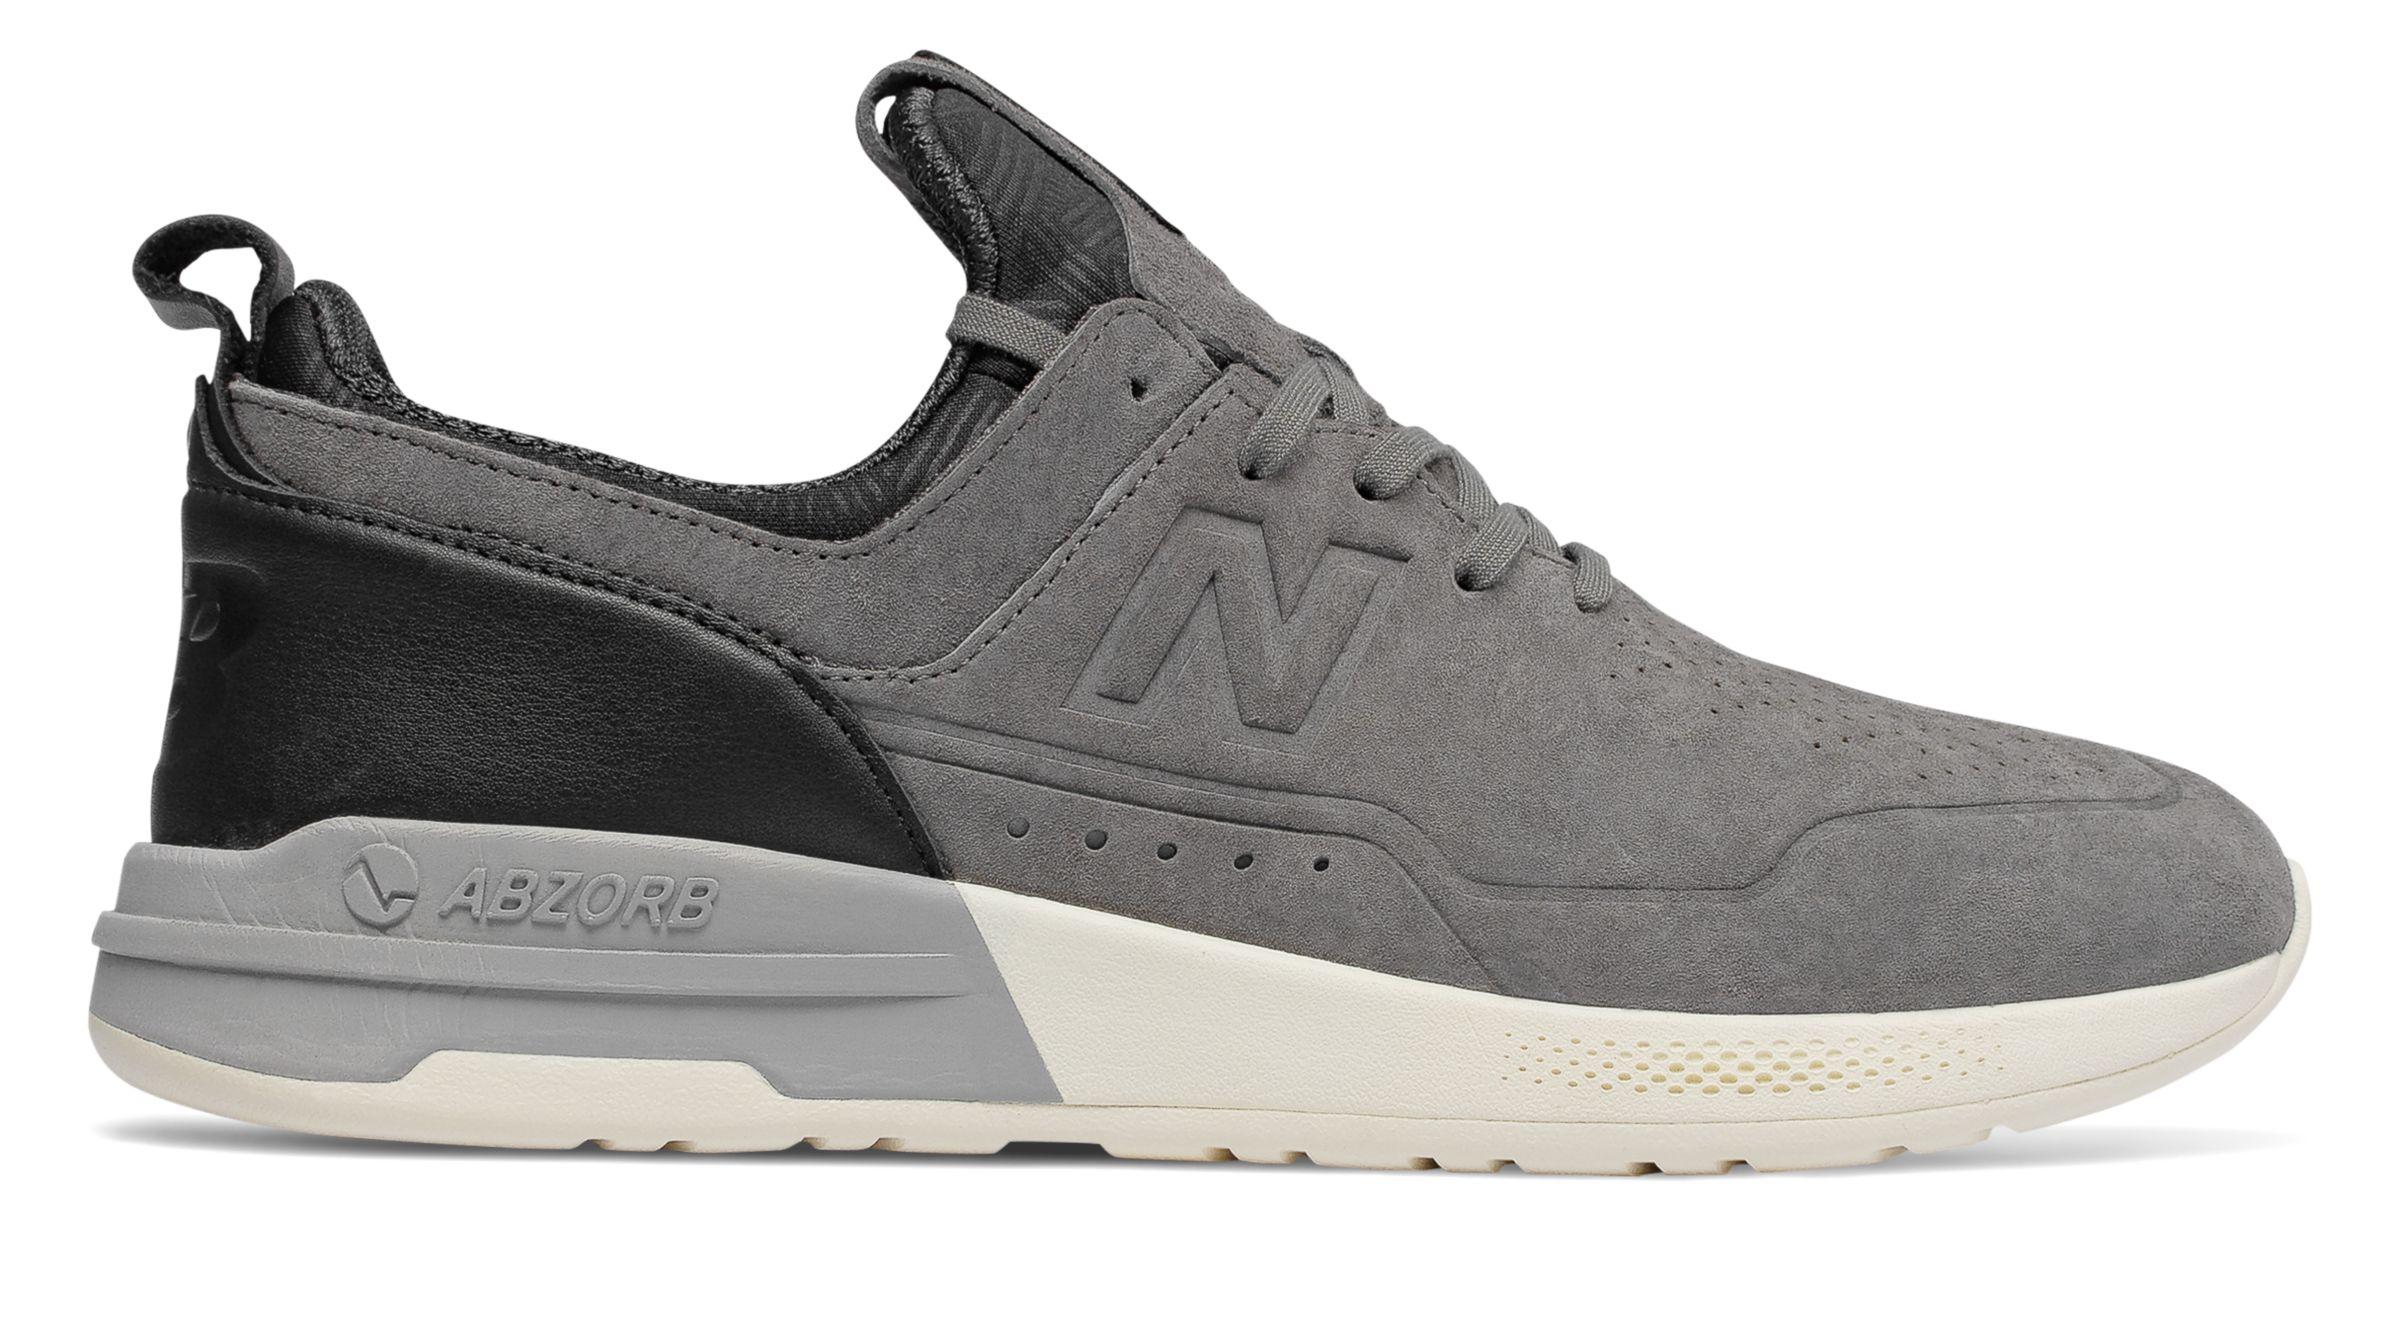 New Balance 365, Castlerock with Black